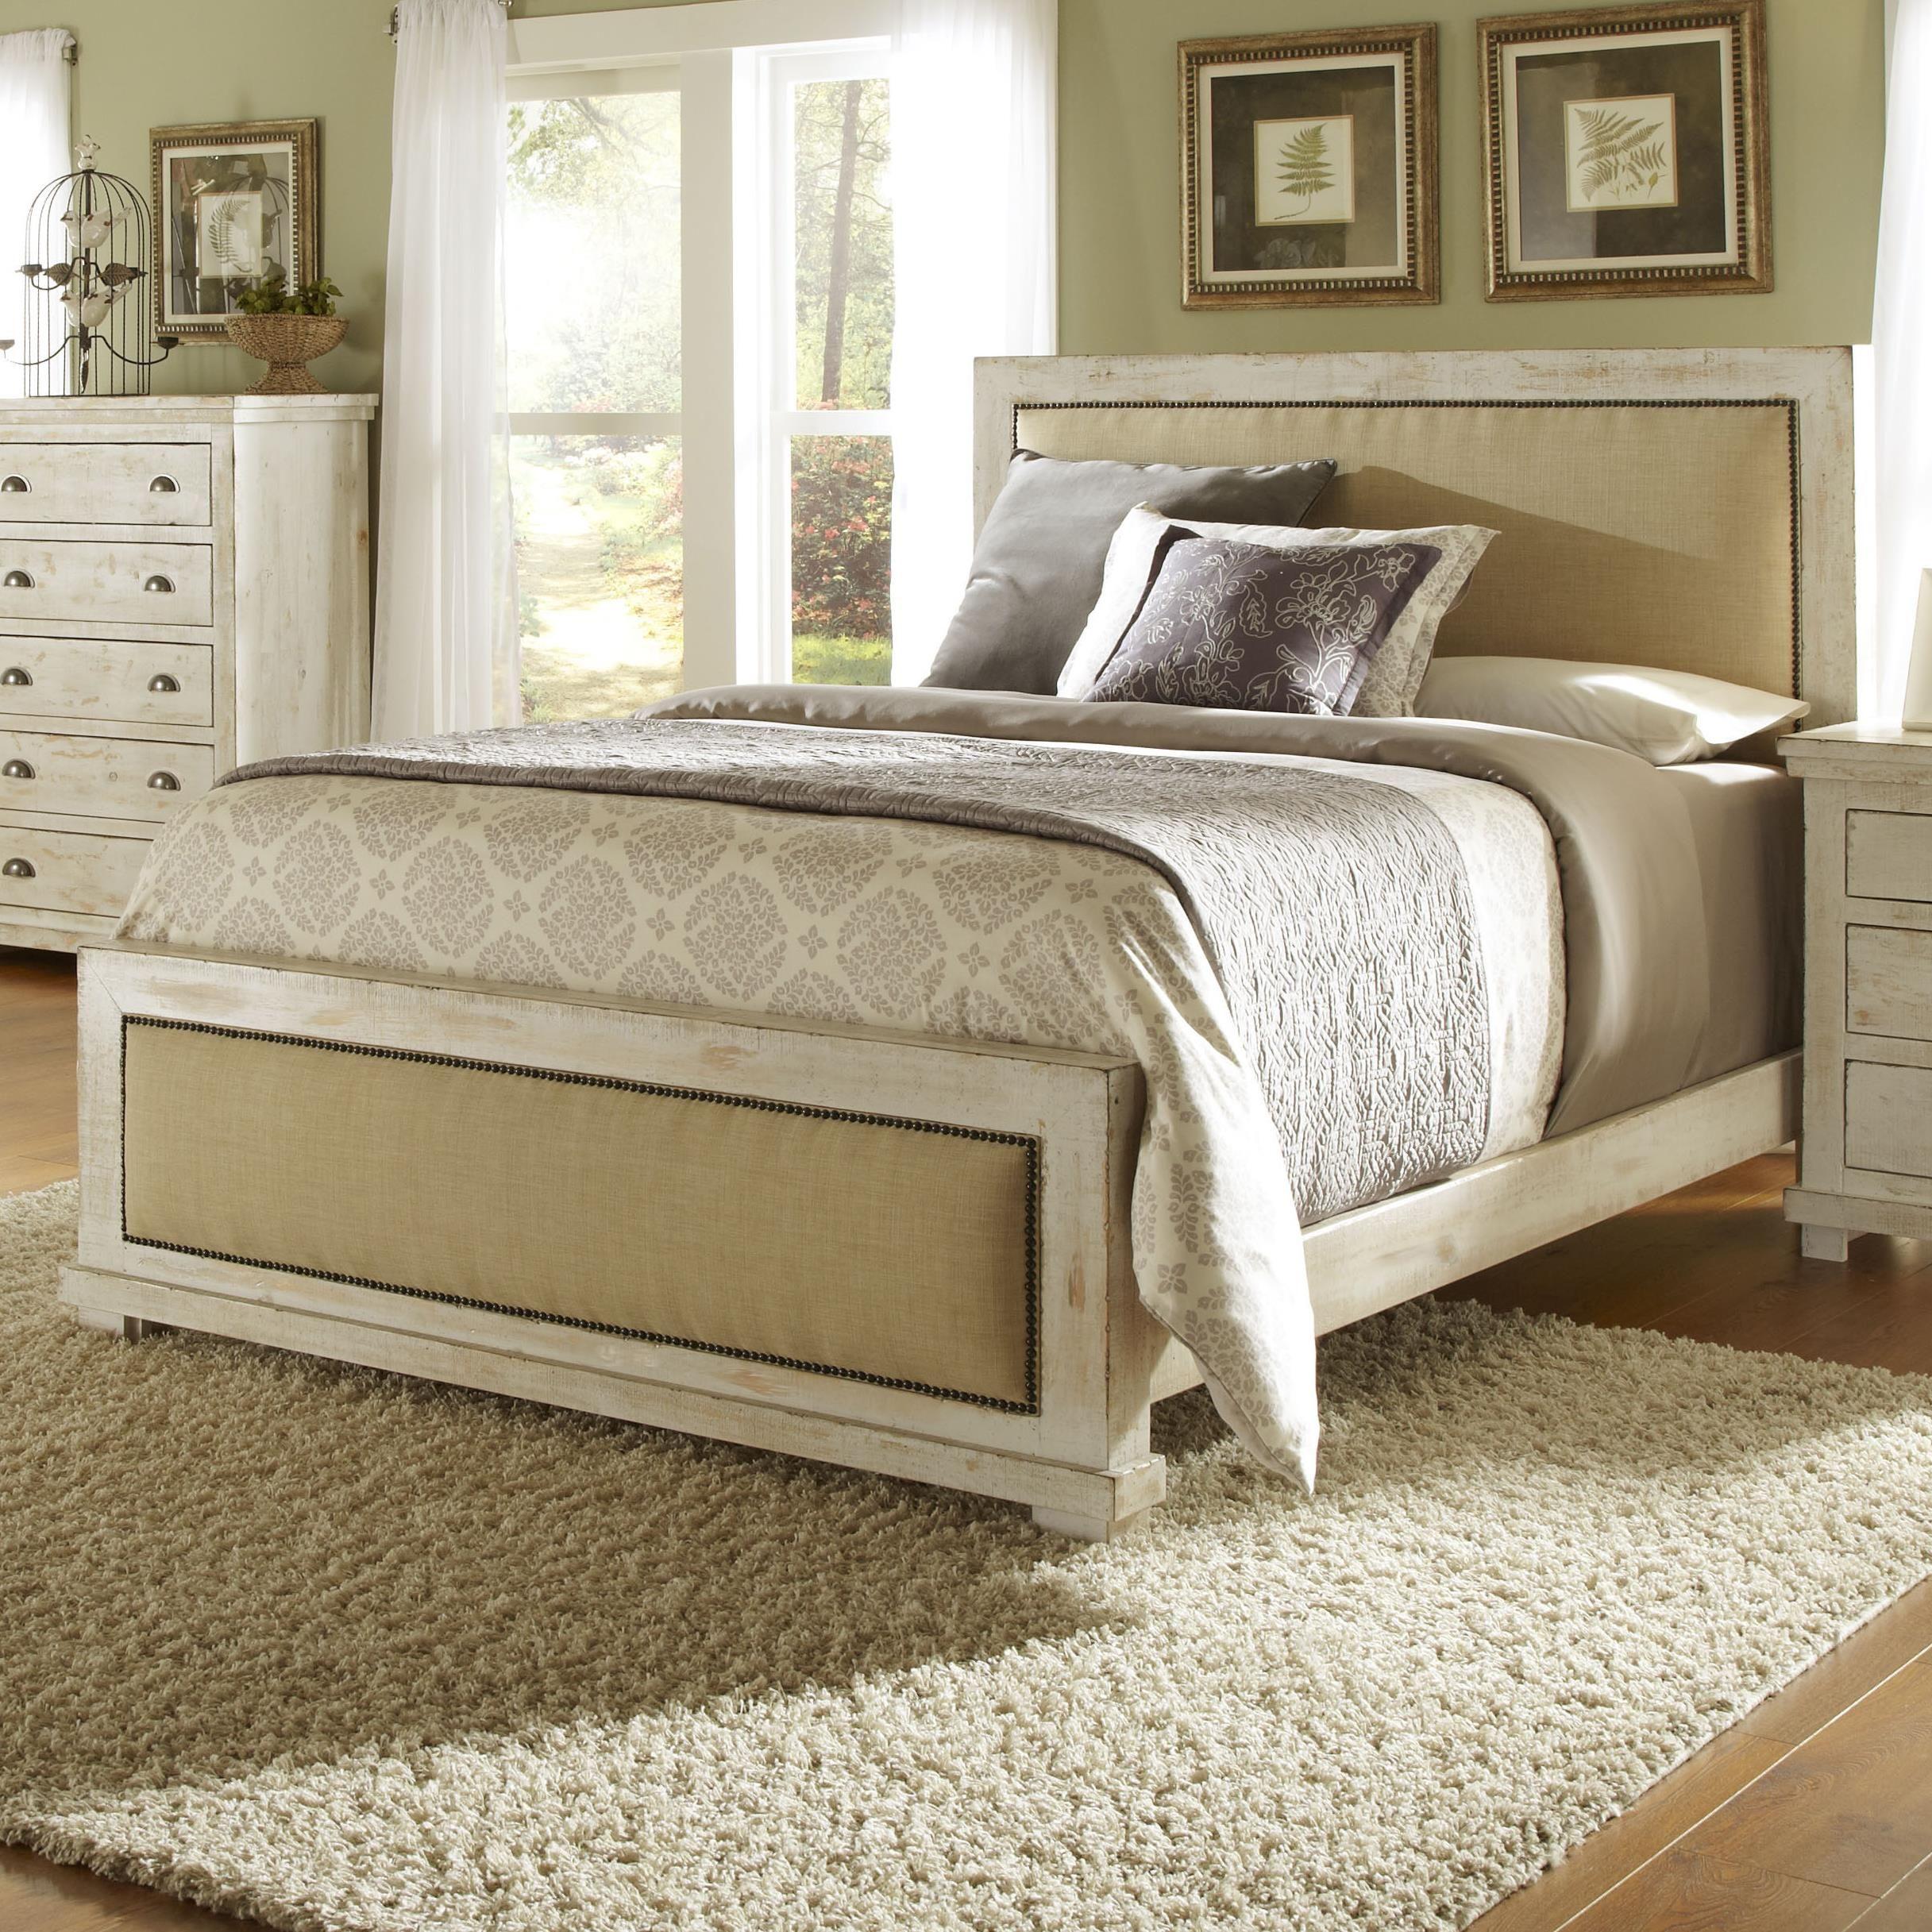 Demarlos B693 By Signature Design By Ashley Ivan Smith Furniture Signature Design By Ashley Demarlo Bedroom Furniture Sets Bedroom Sets Queen Bedroom Set